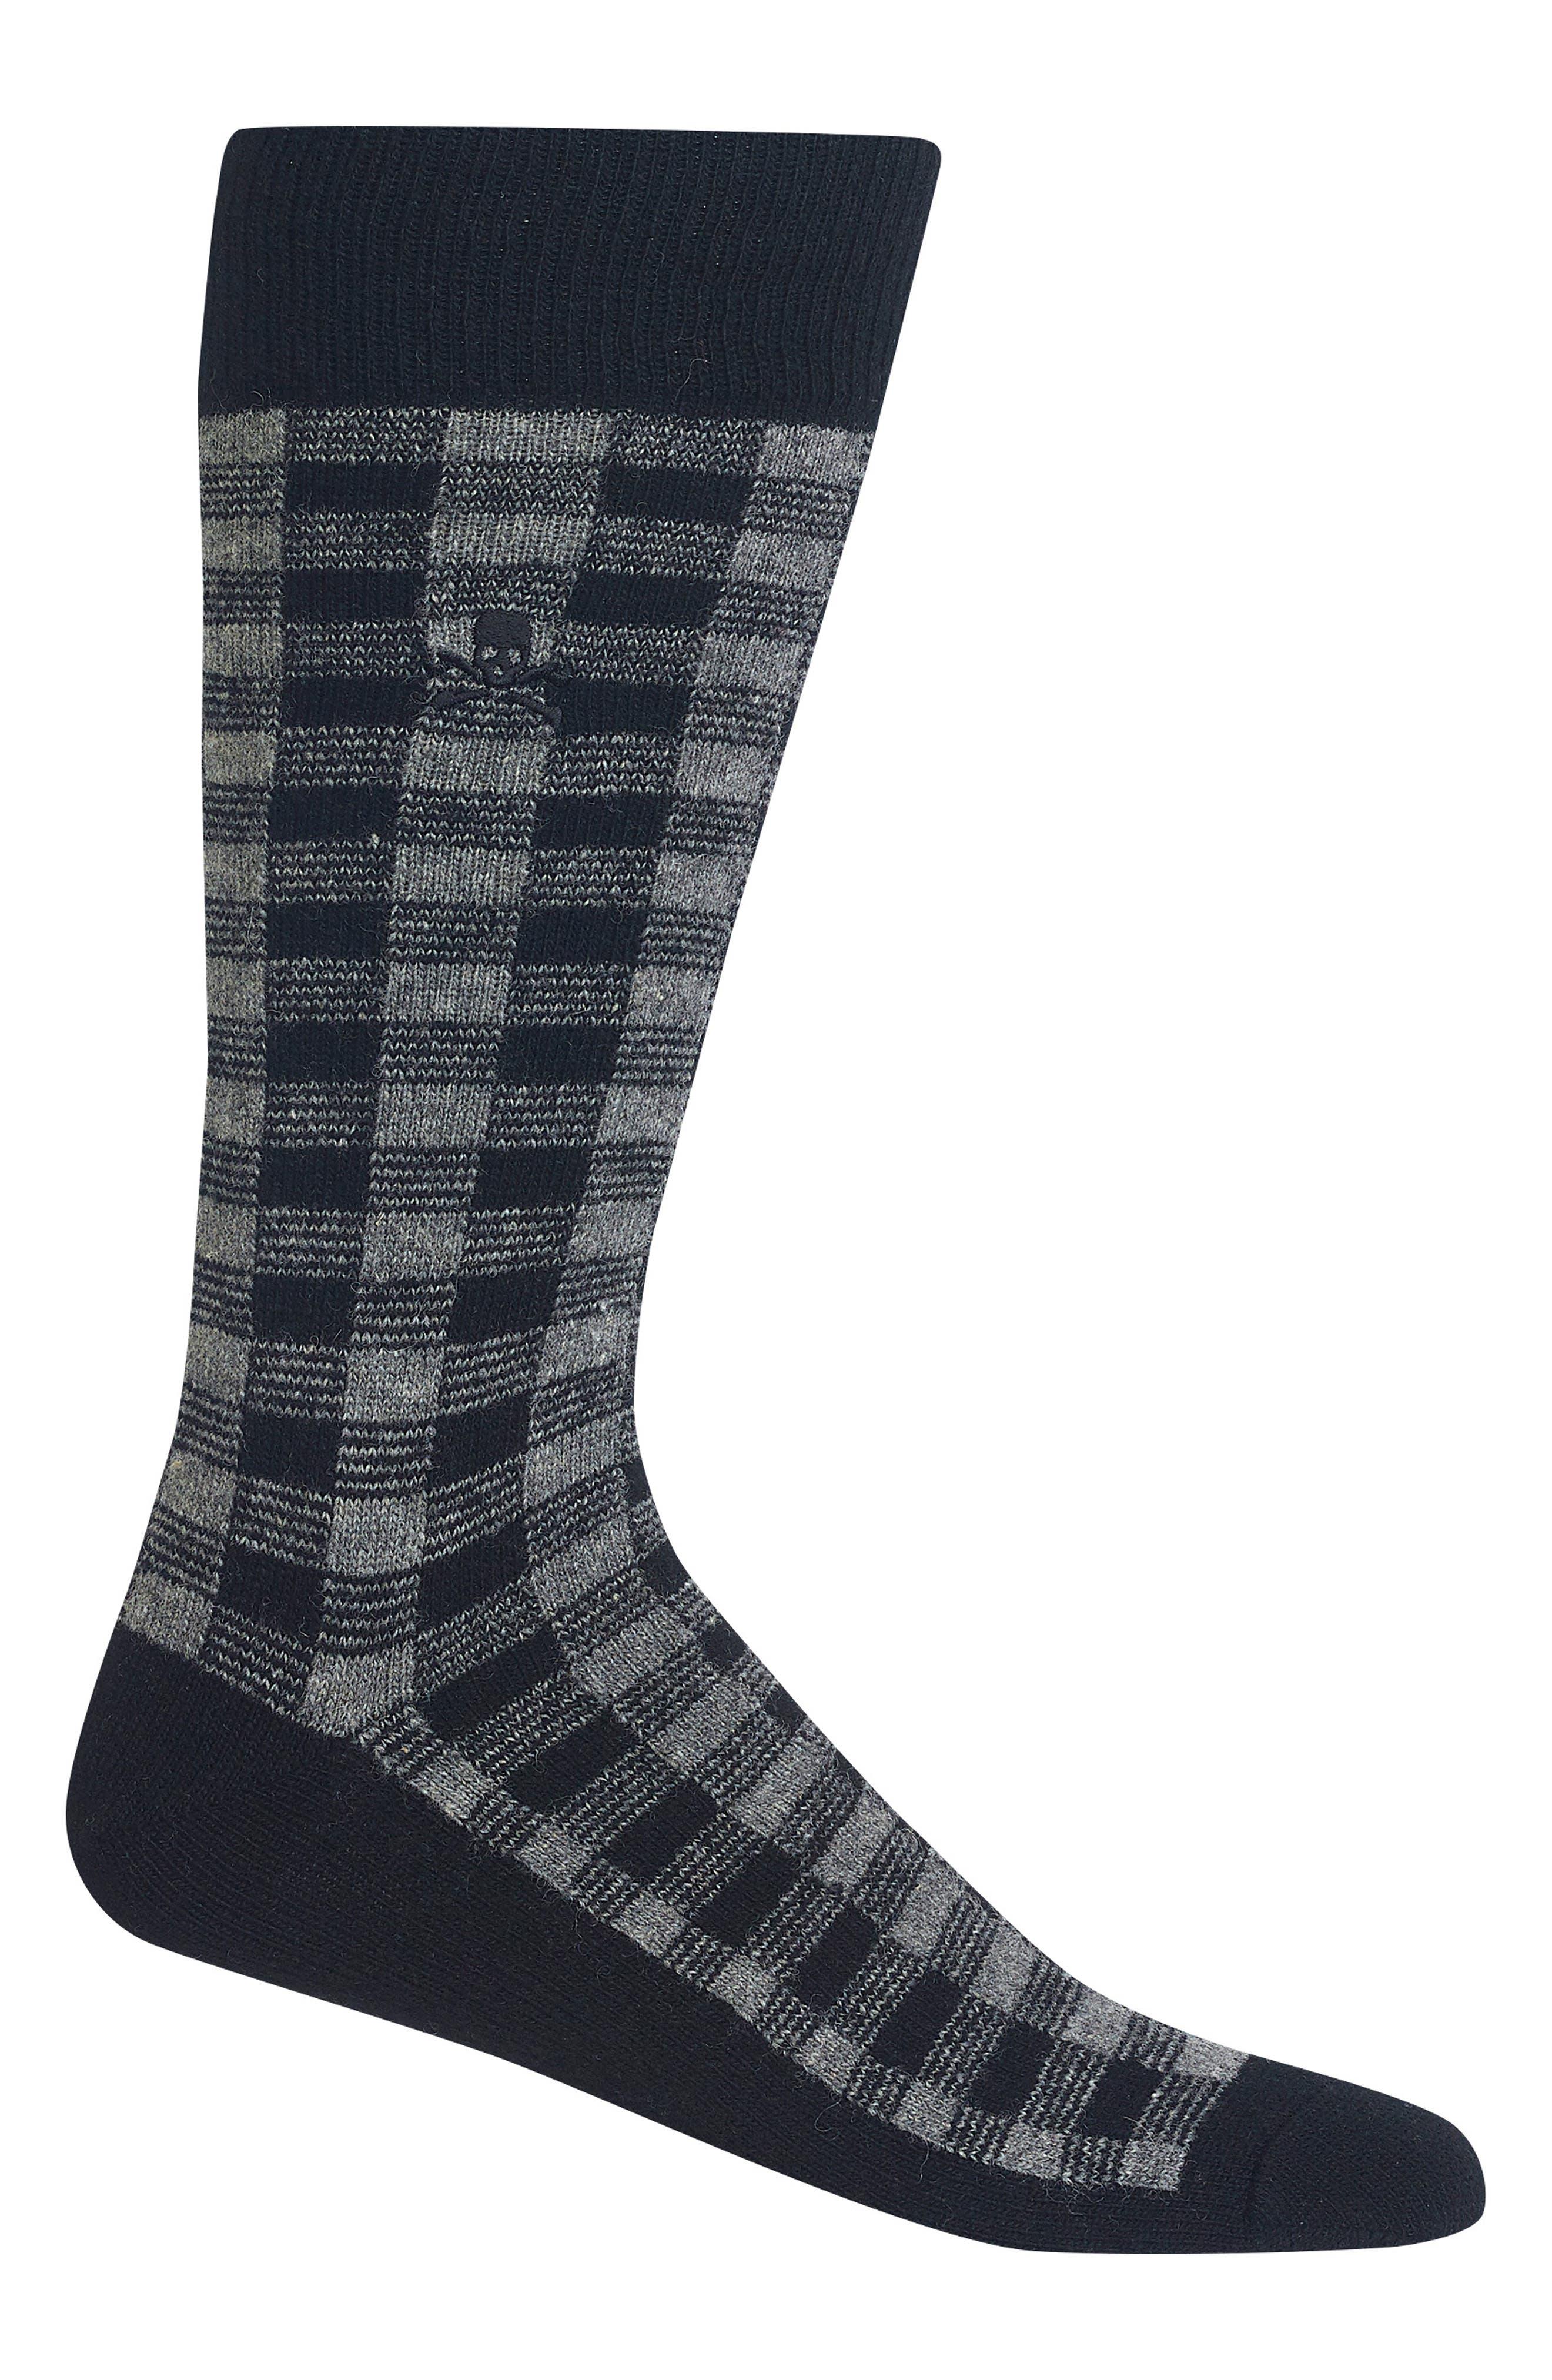 RALPH LAUREN Buffalo Plaid Socks, Main, color, GREY